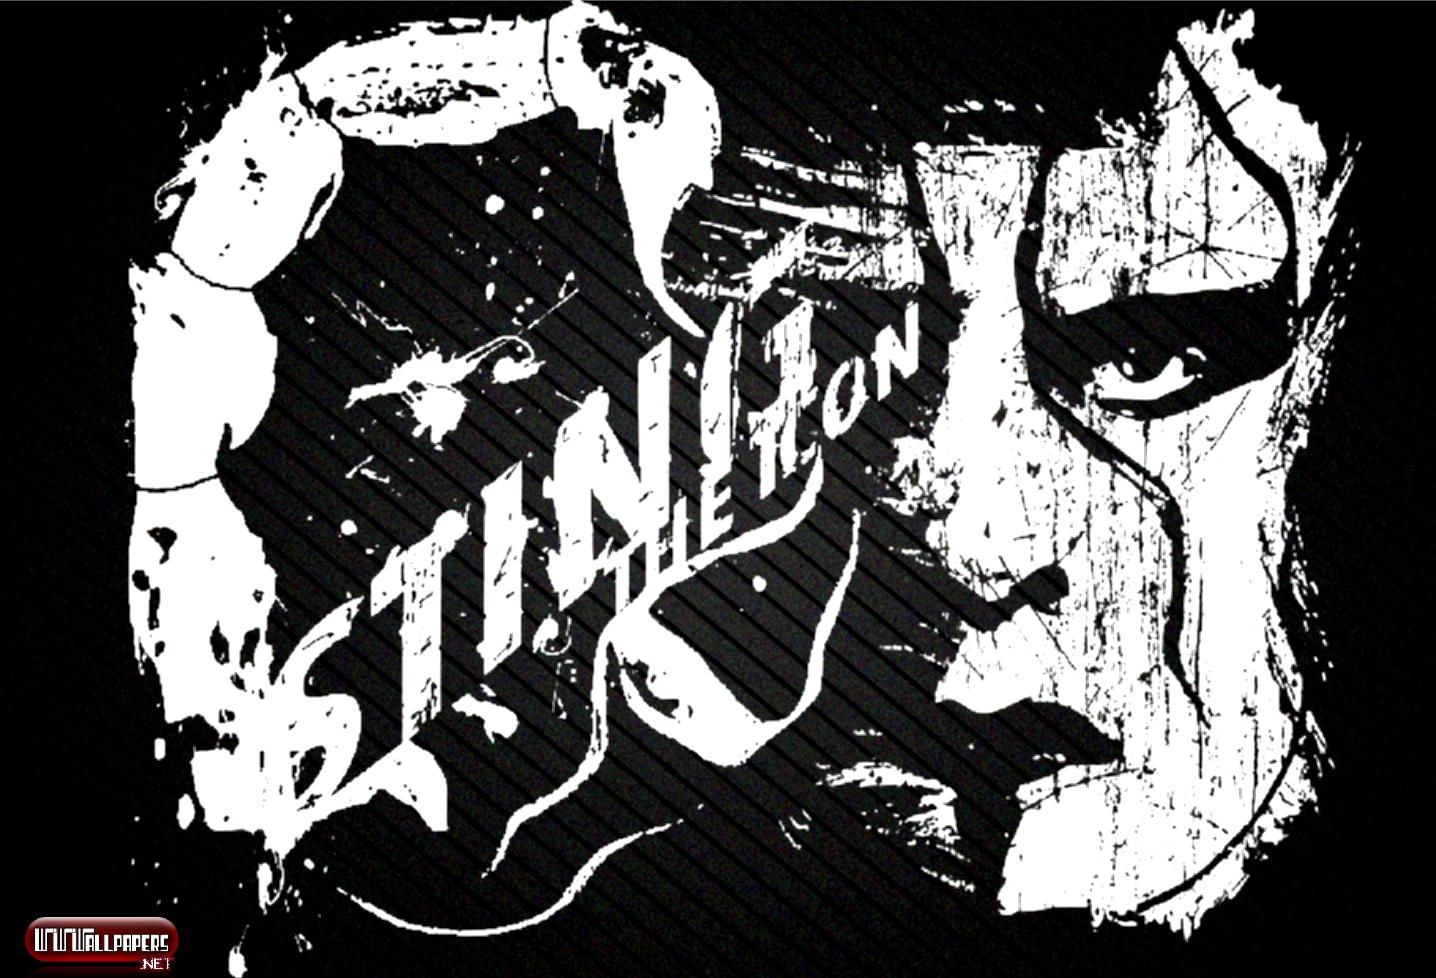 Batista Hd Wallpaper Wwwallpapers Wwewrestlingwallpapers Wallpapers Fondos